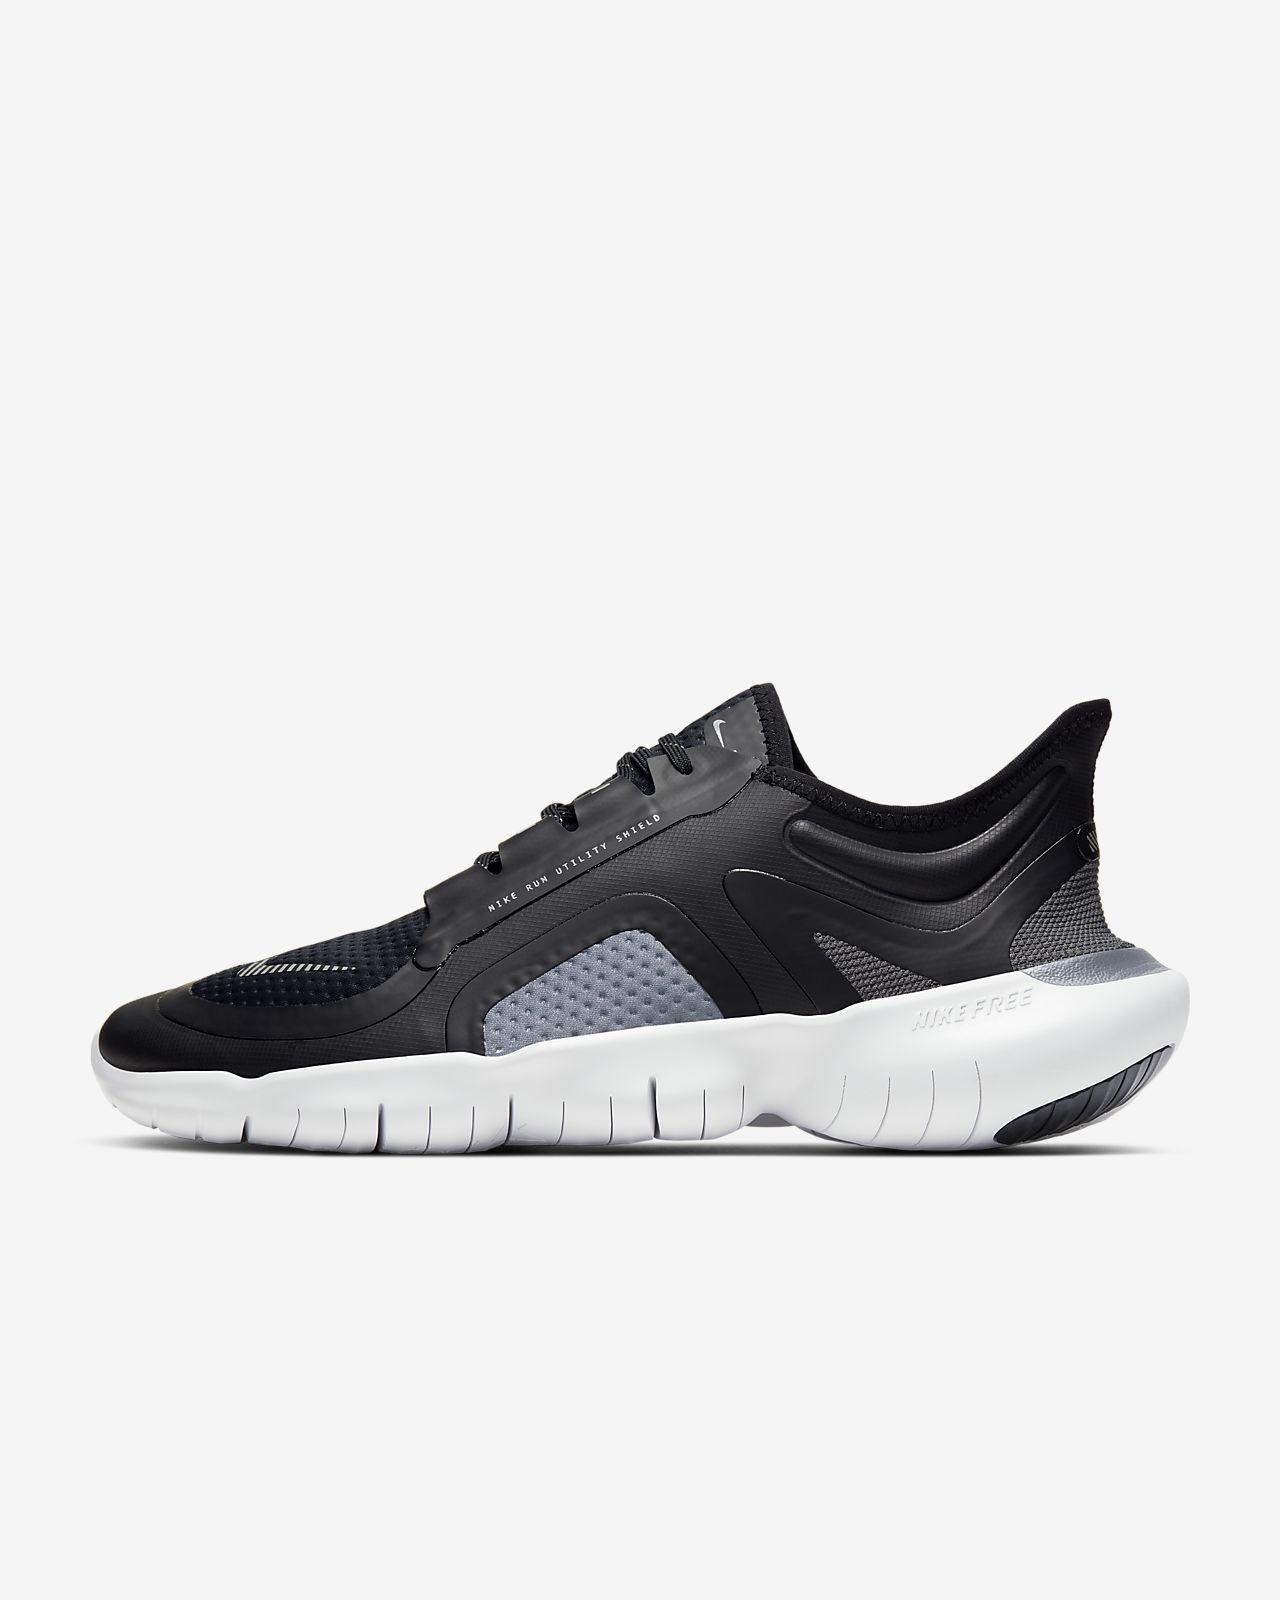 Nike Free RN 5.0 Shield 男子跑步鞋